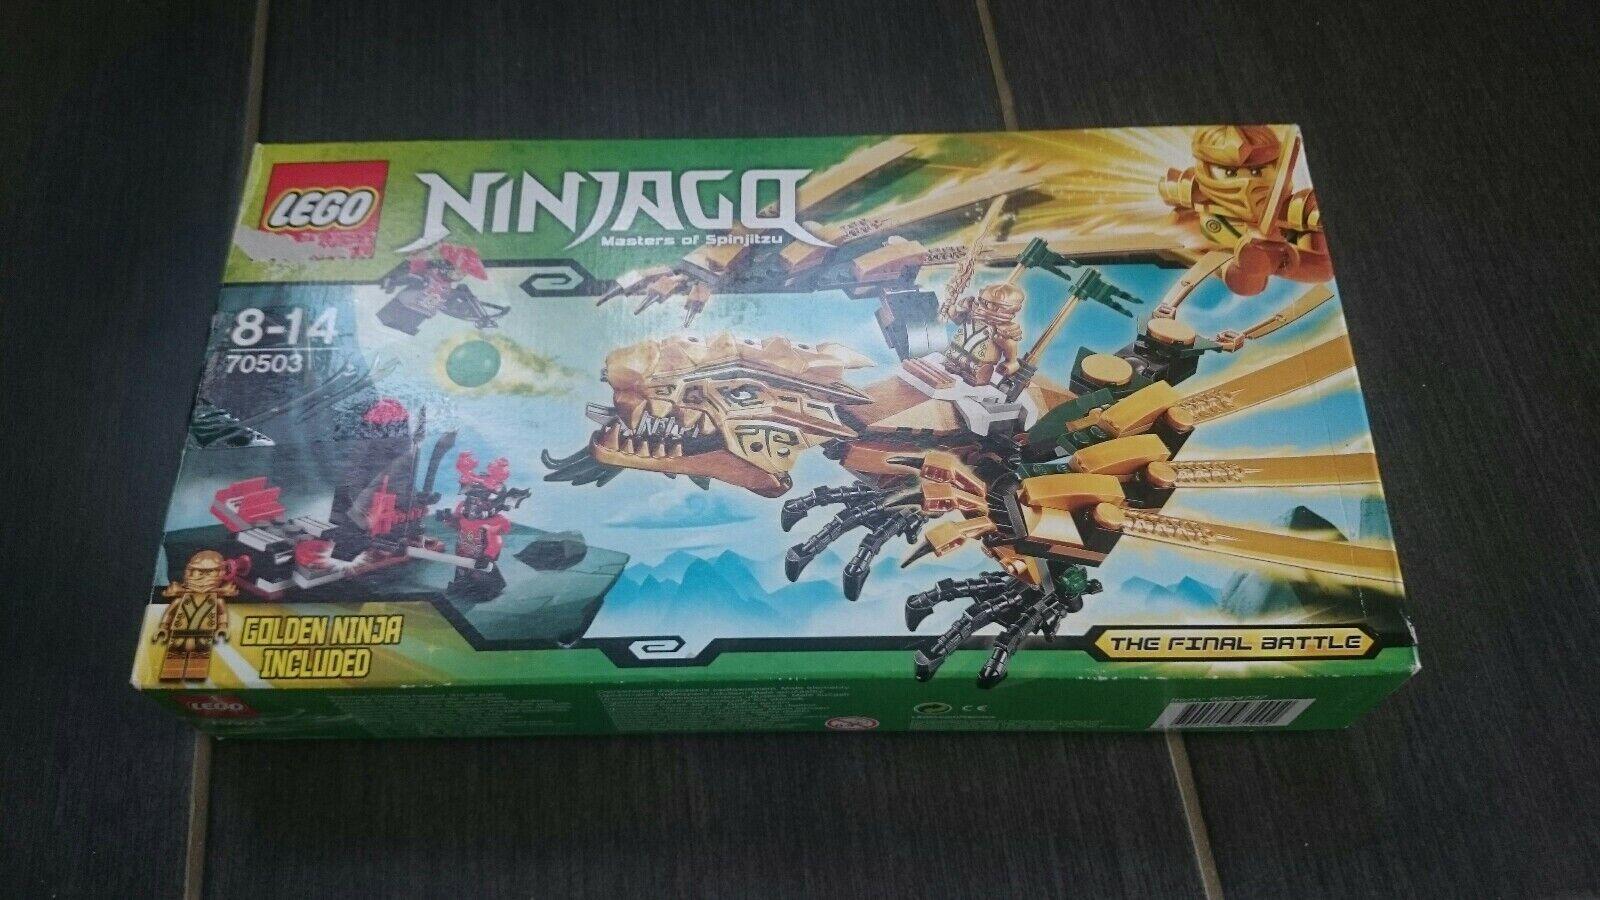 Lego Ninjago 70503 Doré Dragon Masters of Spinjitzu 8-14